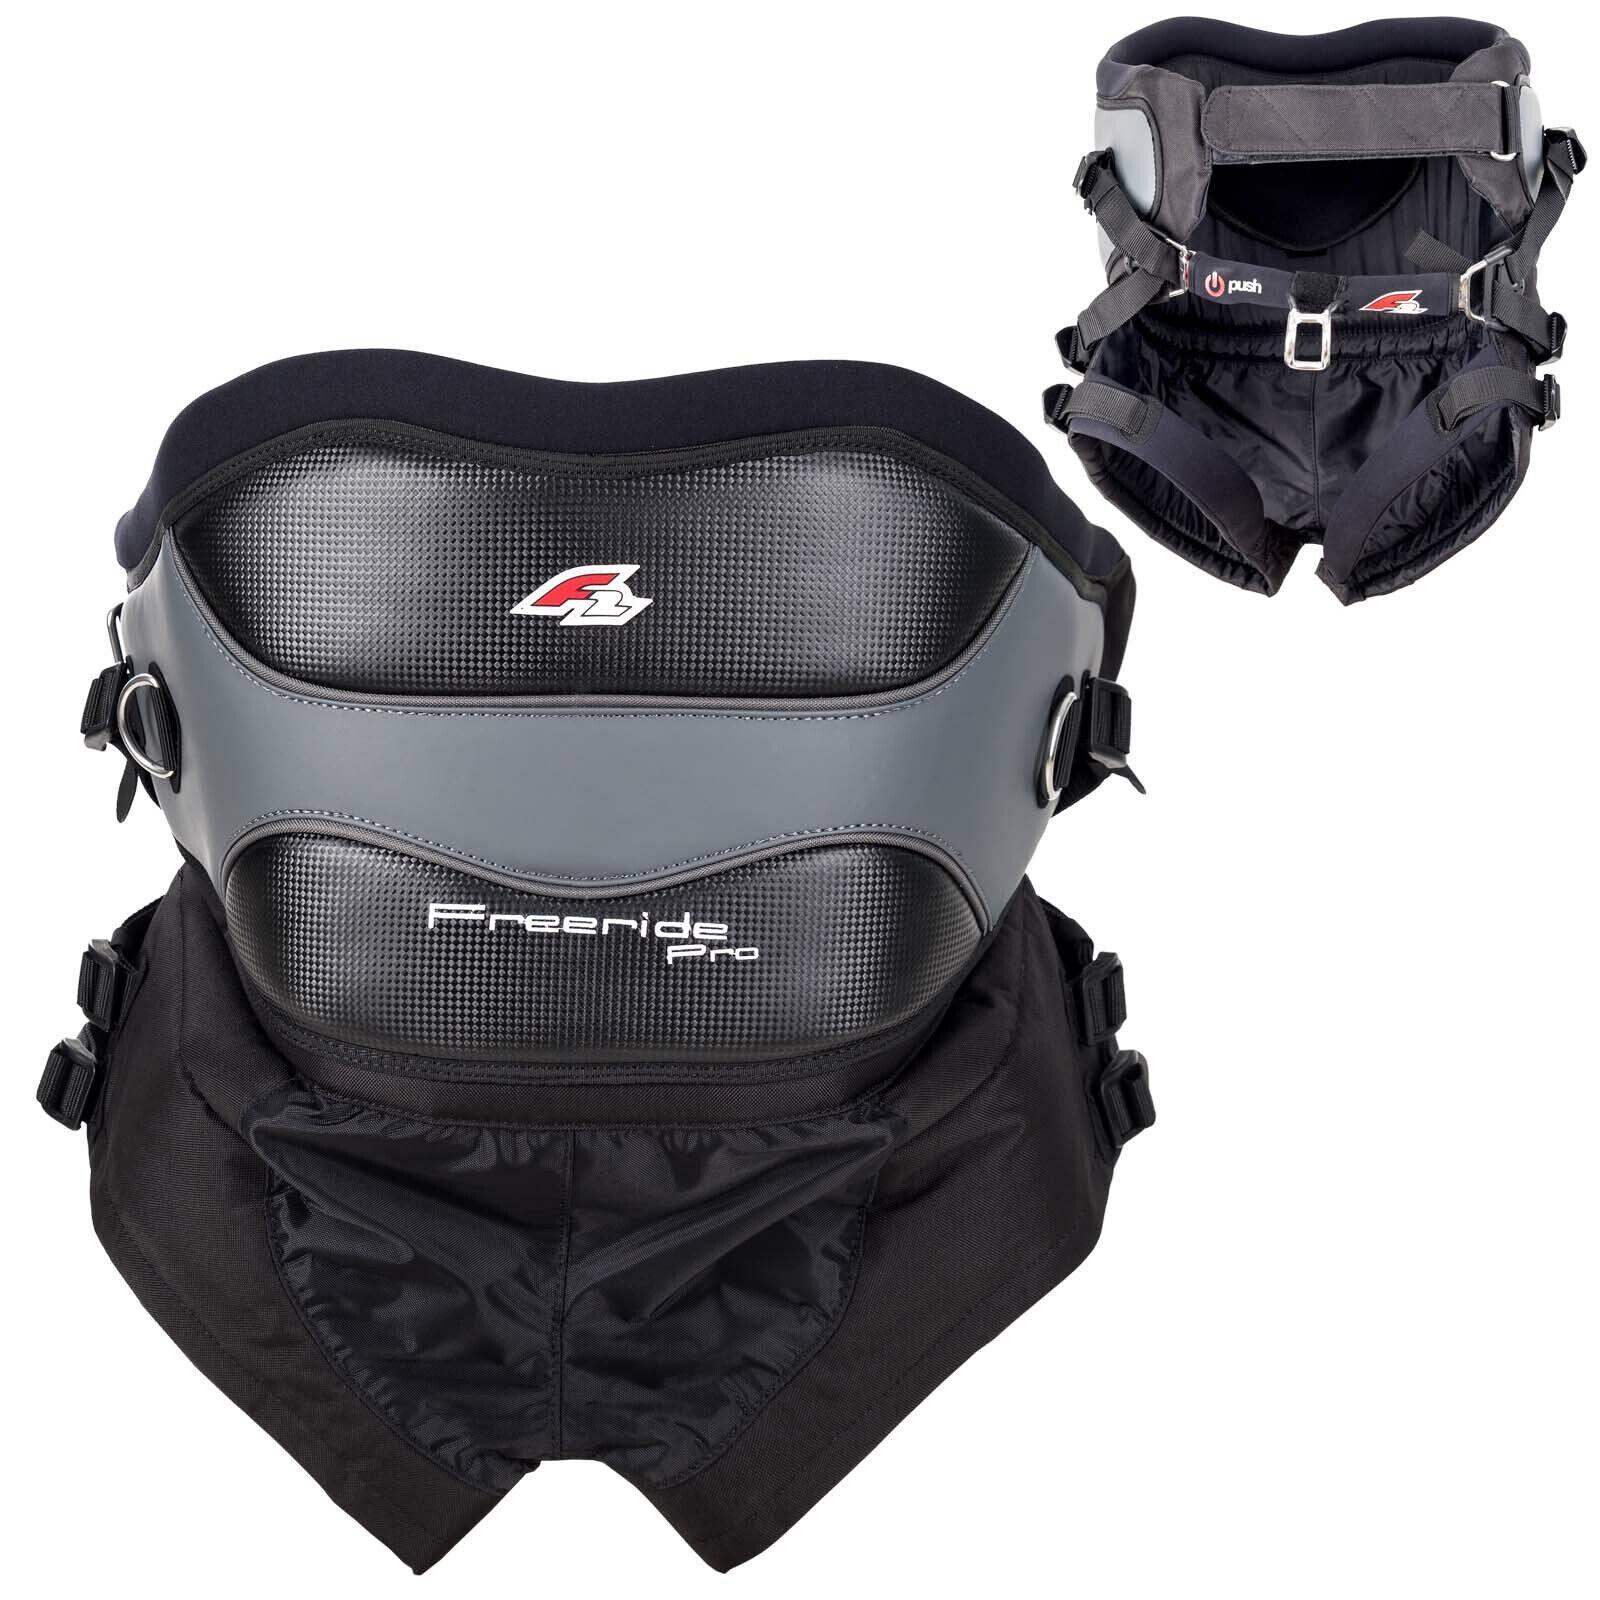 F2 Freeride pro - Seat Arnés Surf Asiento Trapecio M = 48 50 Eu